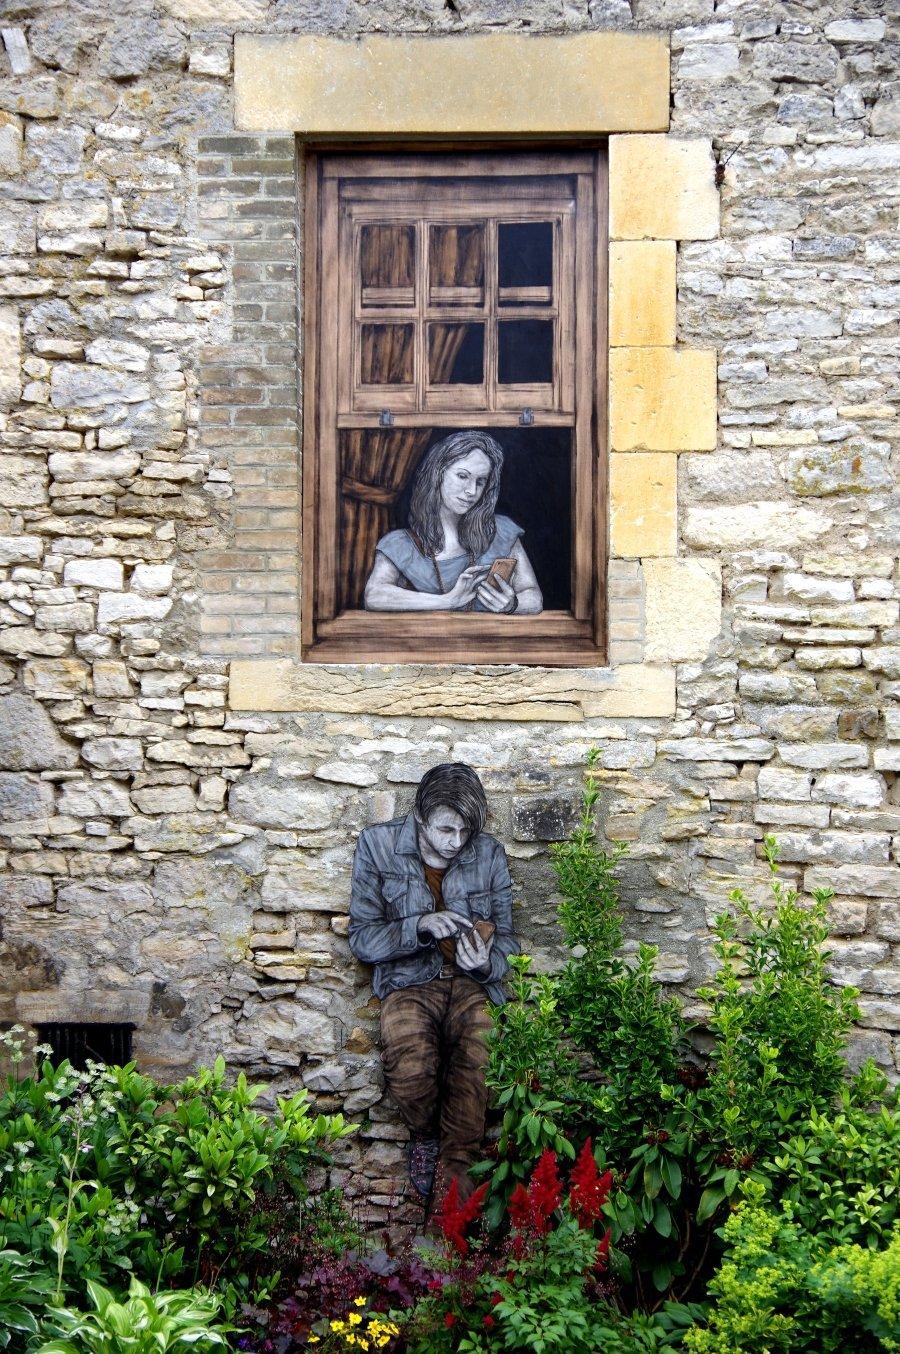 Street art Romeo y Julieta